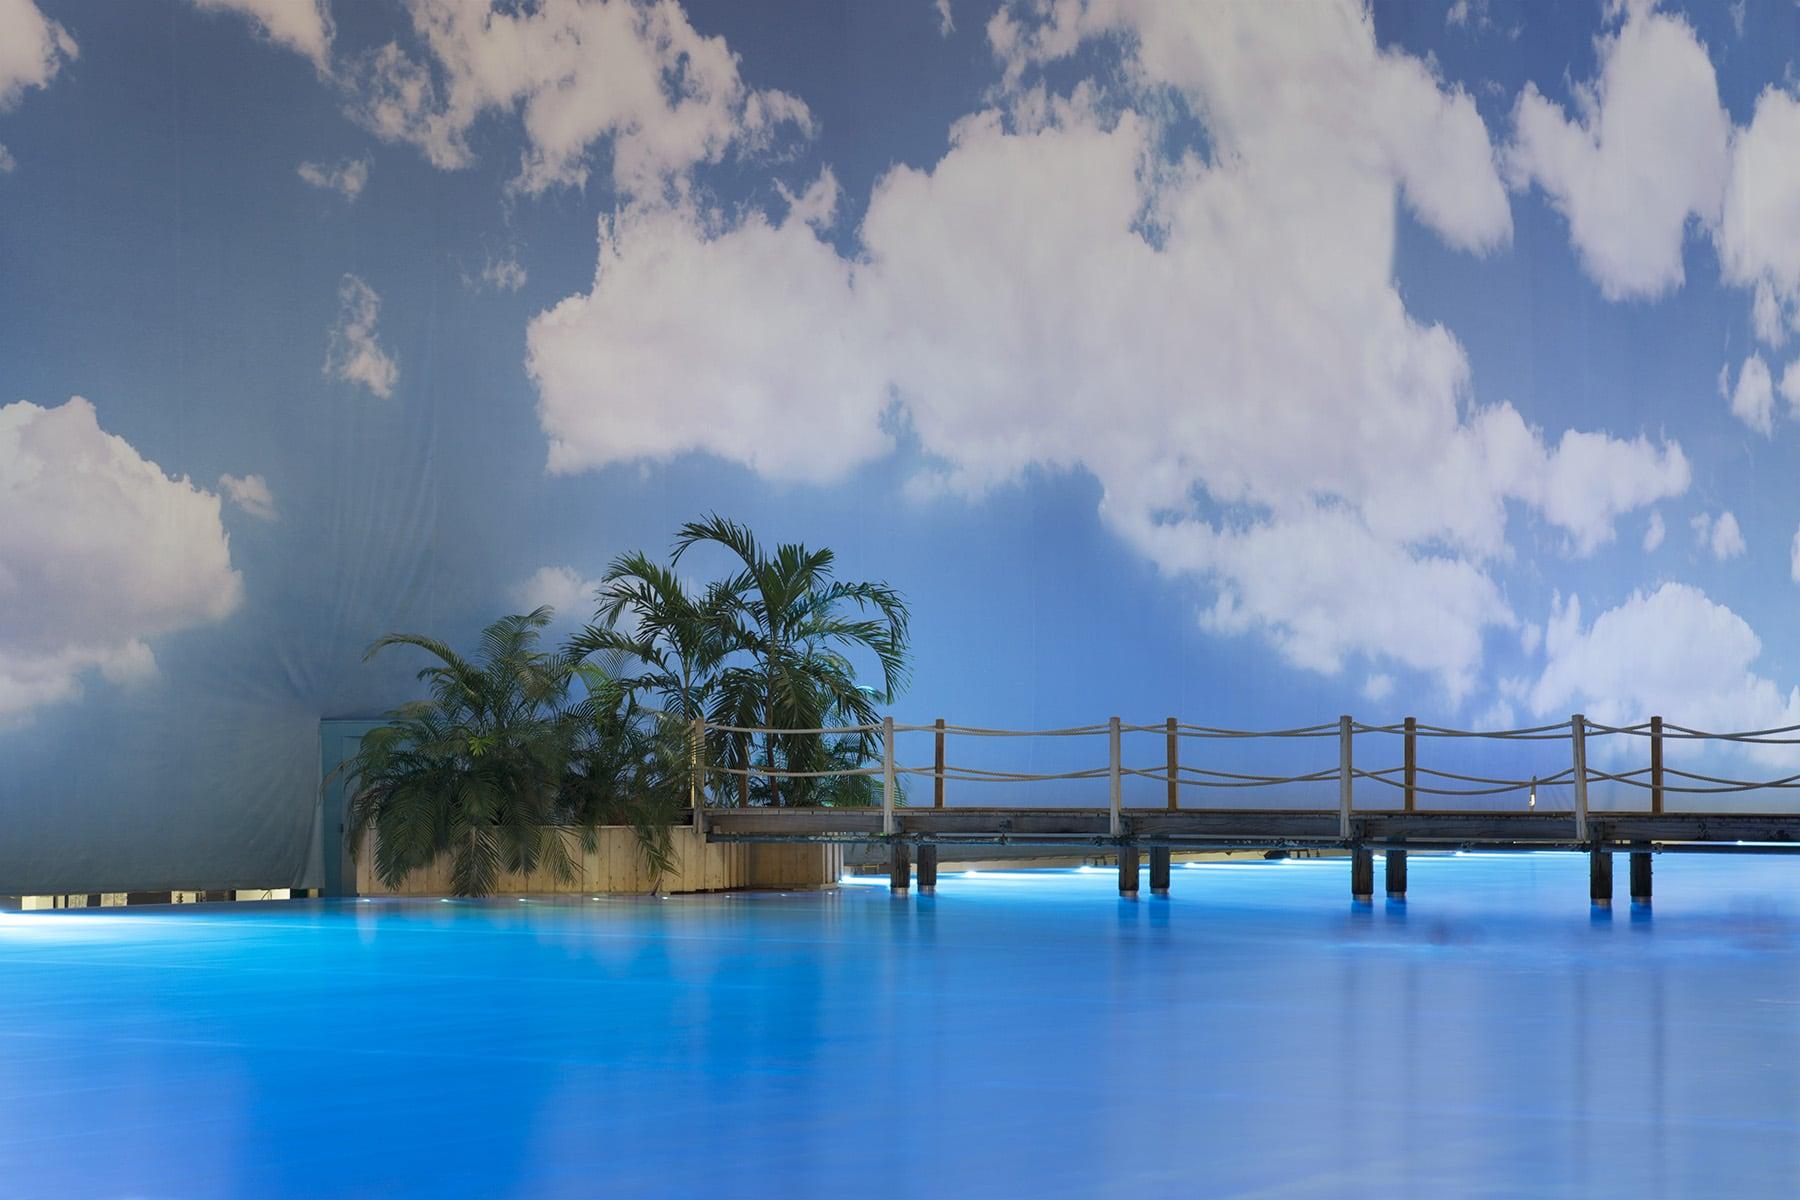 Tropical Sea #4, 2014